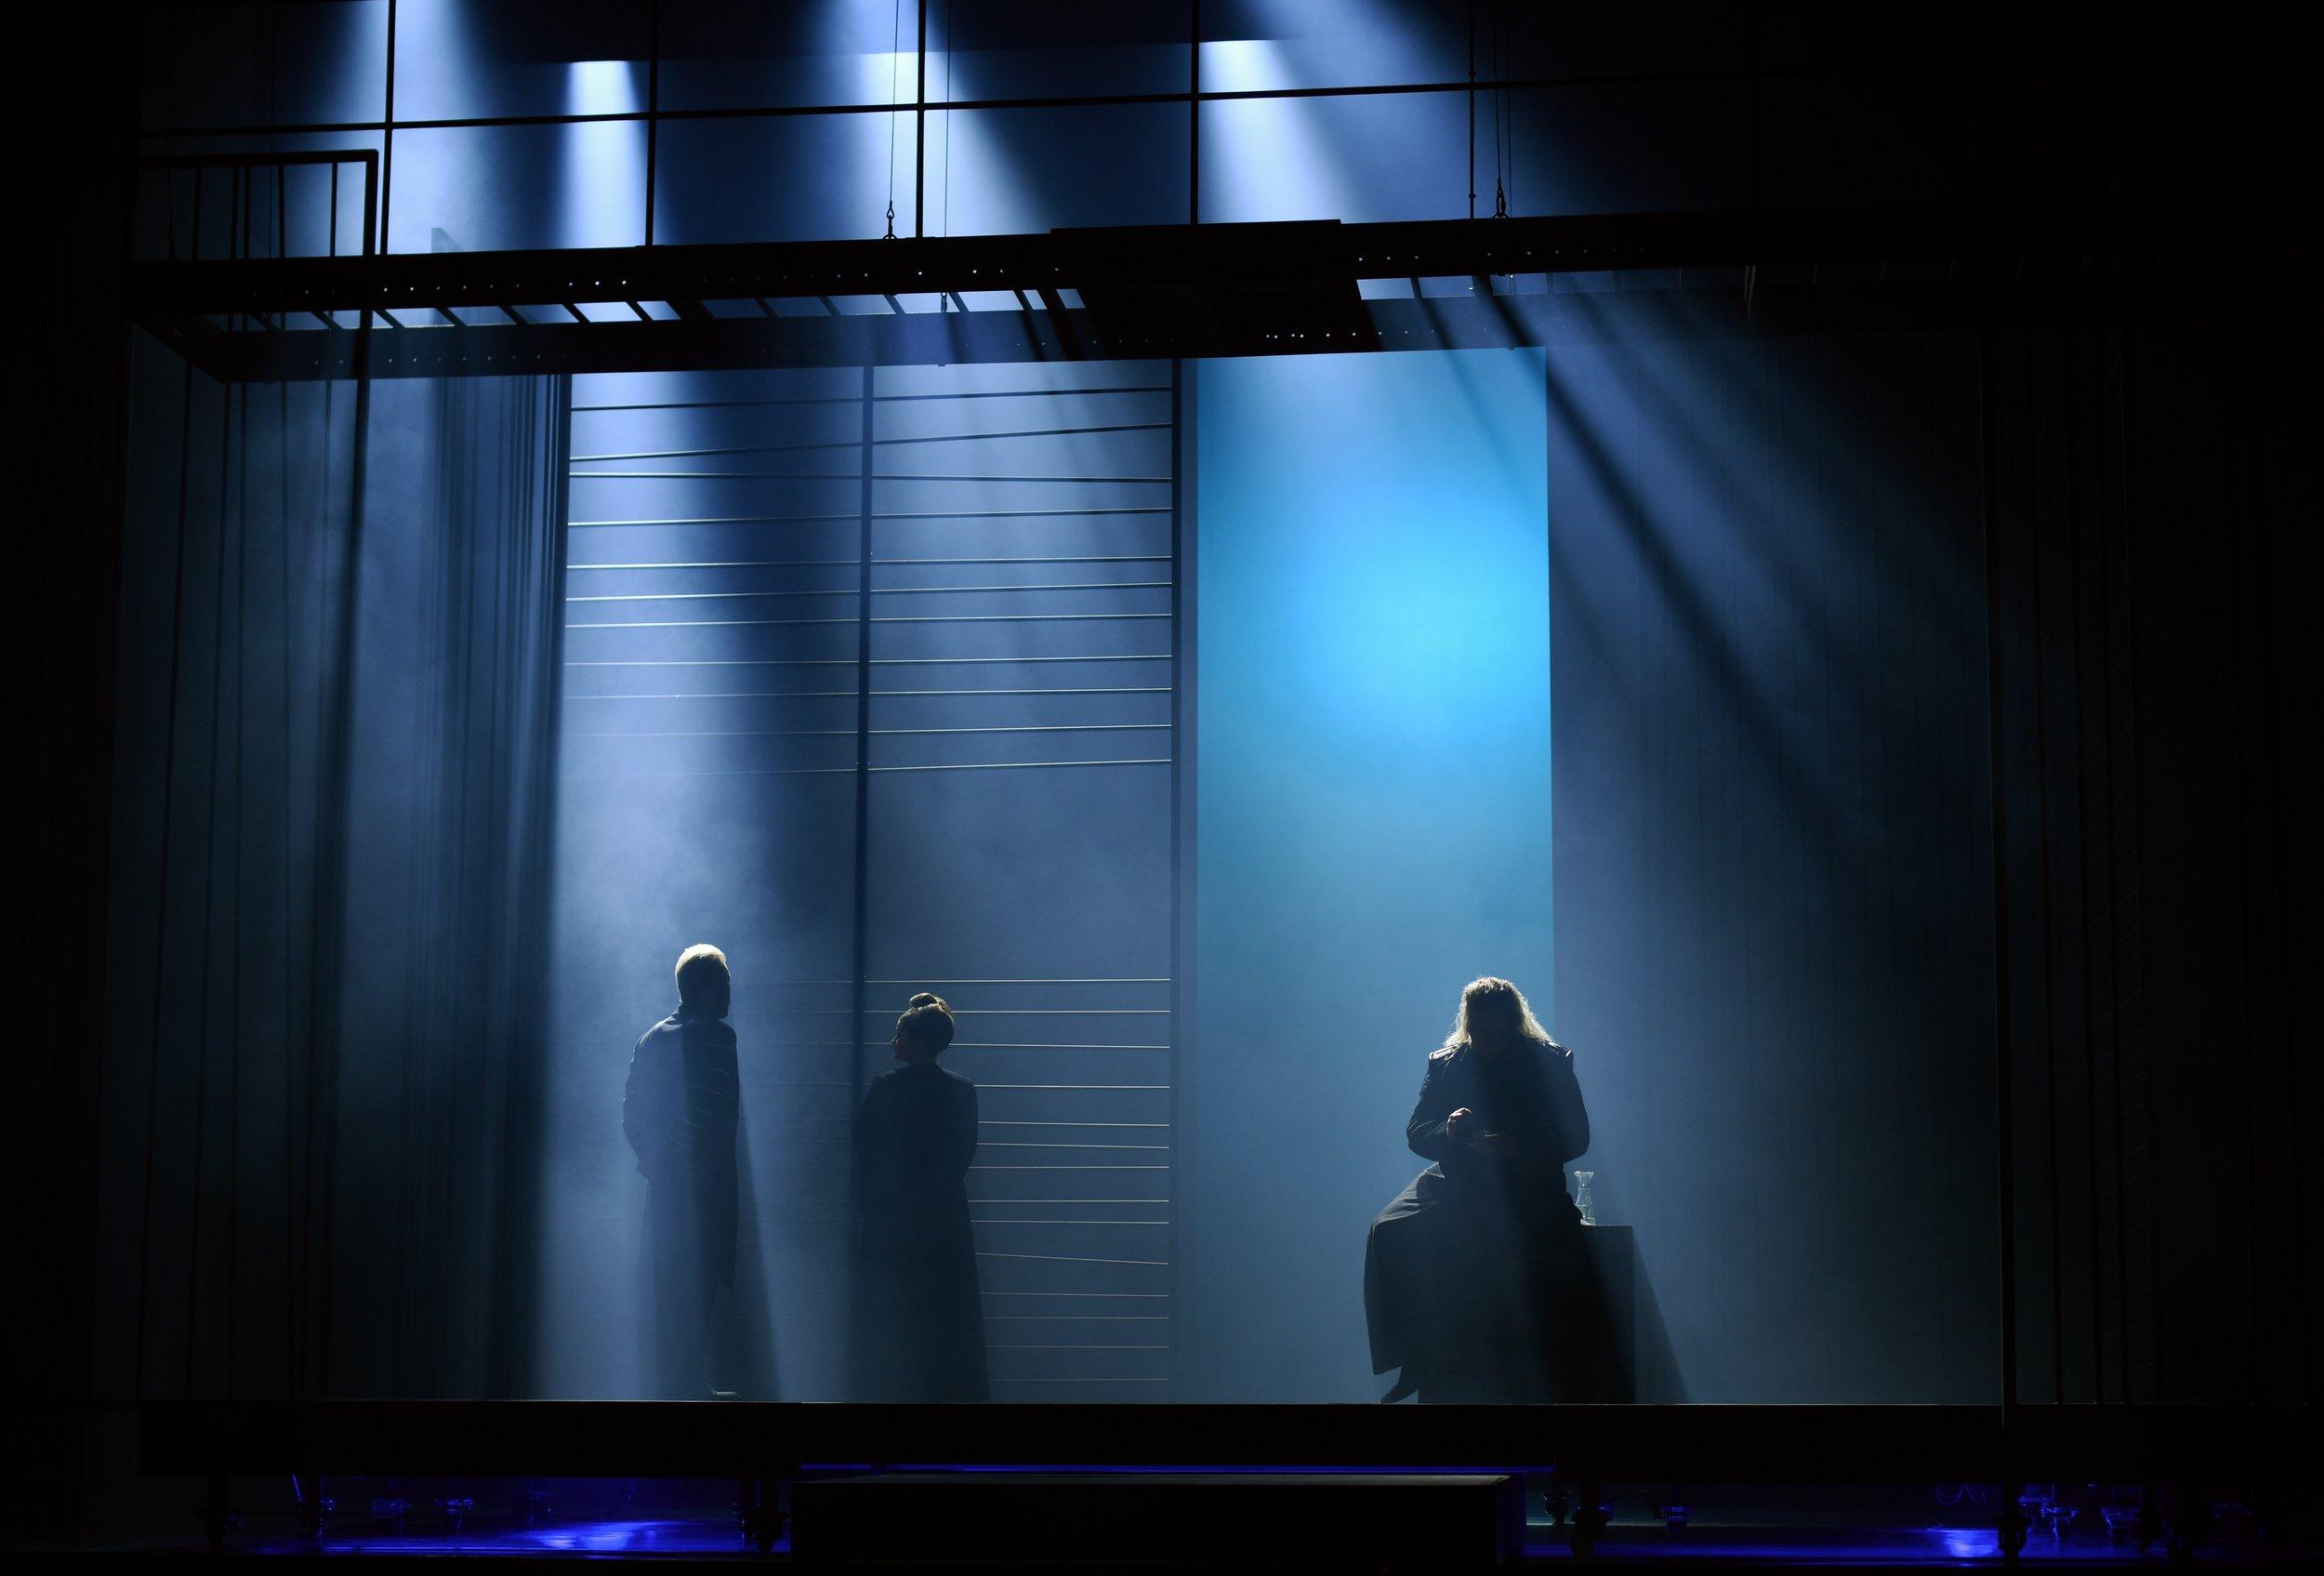 2018_Götterdämmerung_stage design_Oper Kiel_Photo Olaf Struck_3.jpg